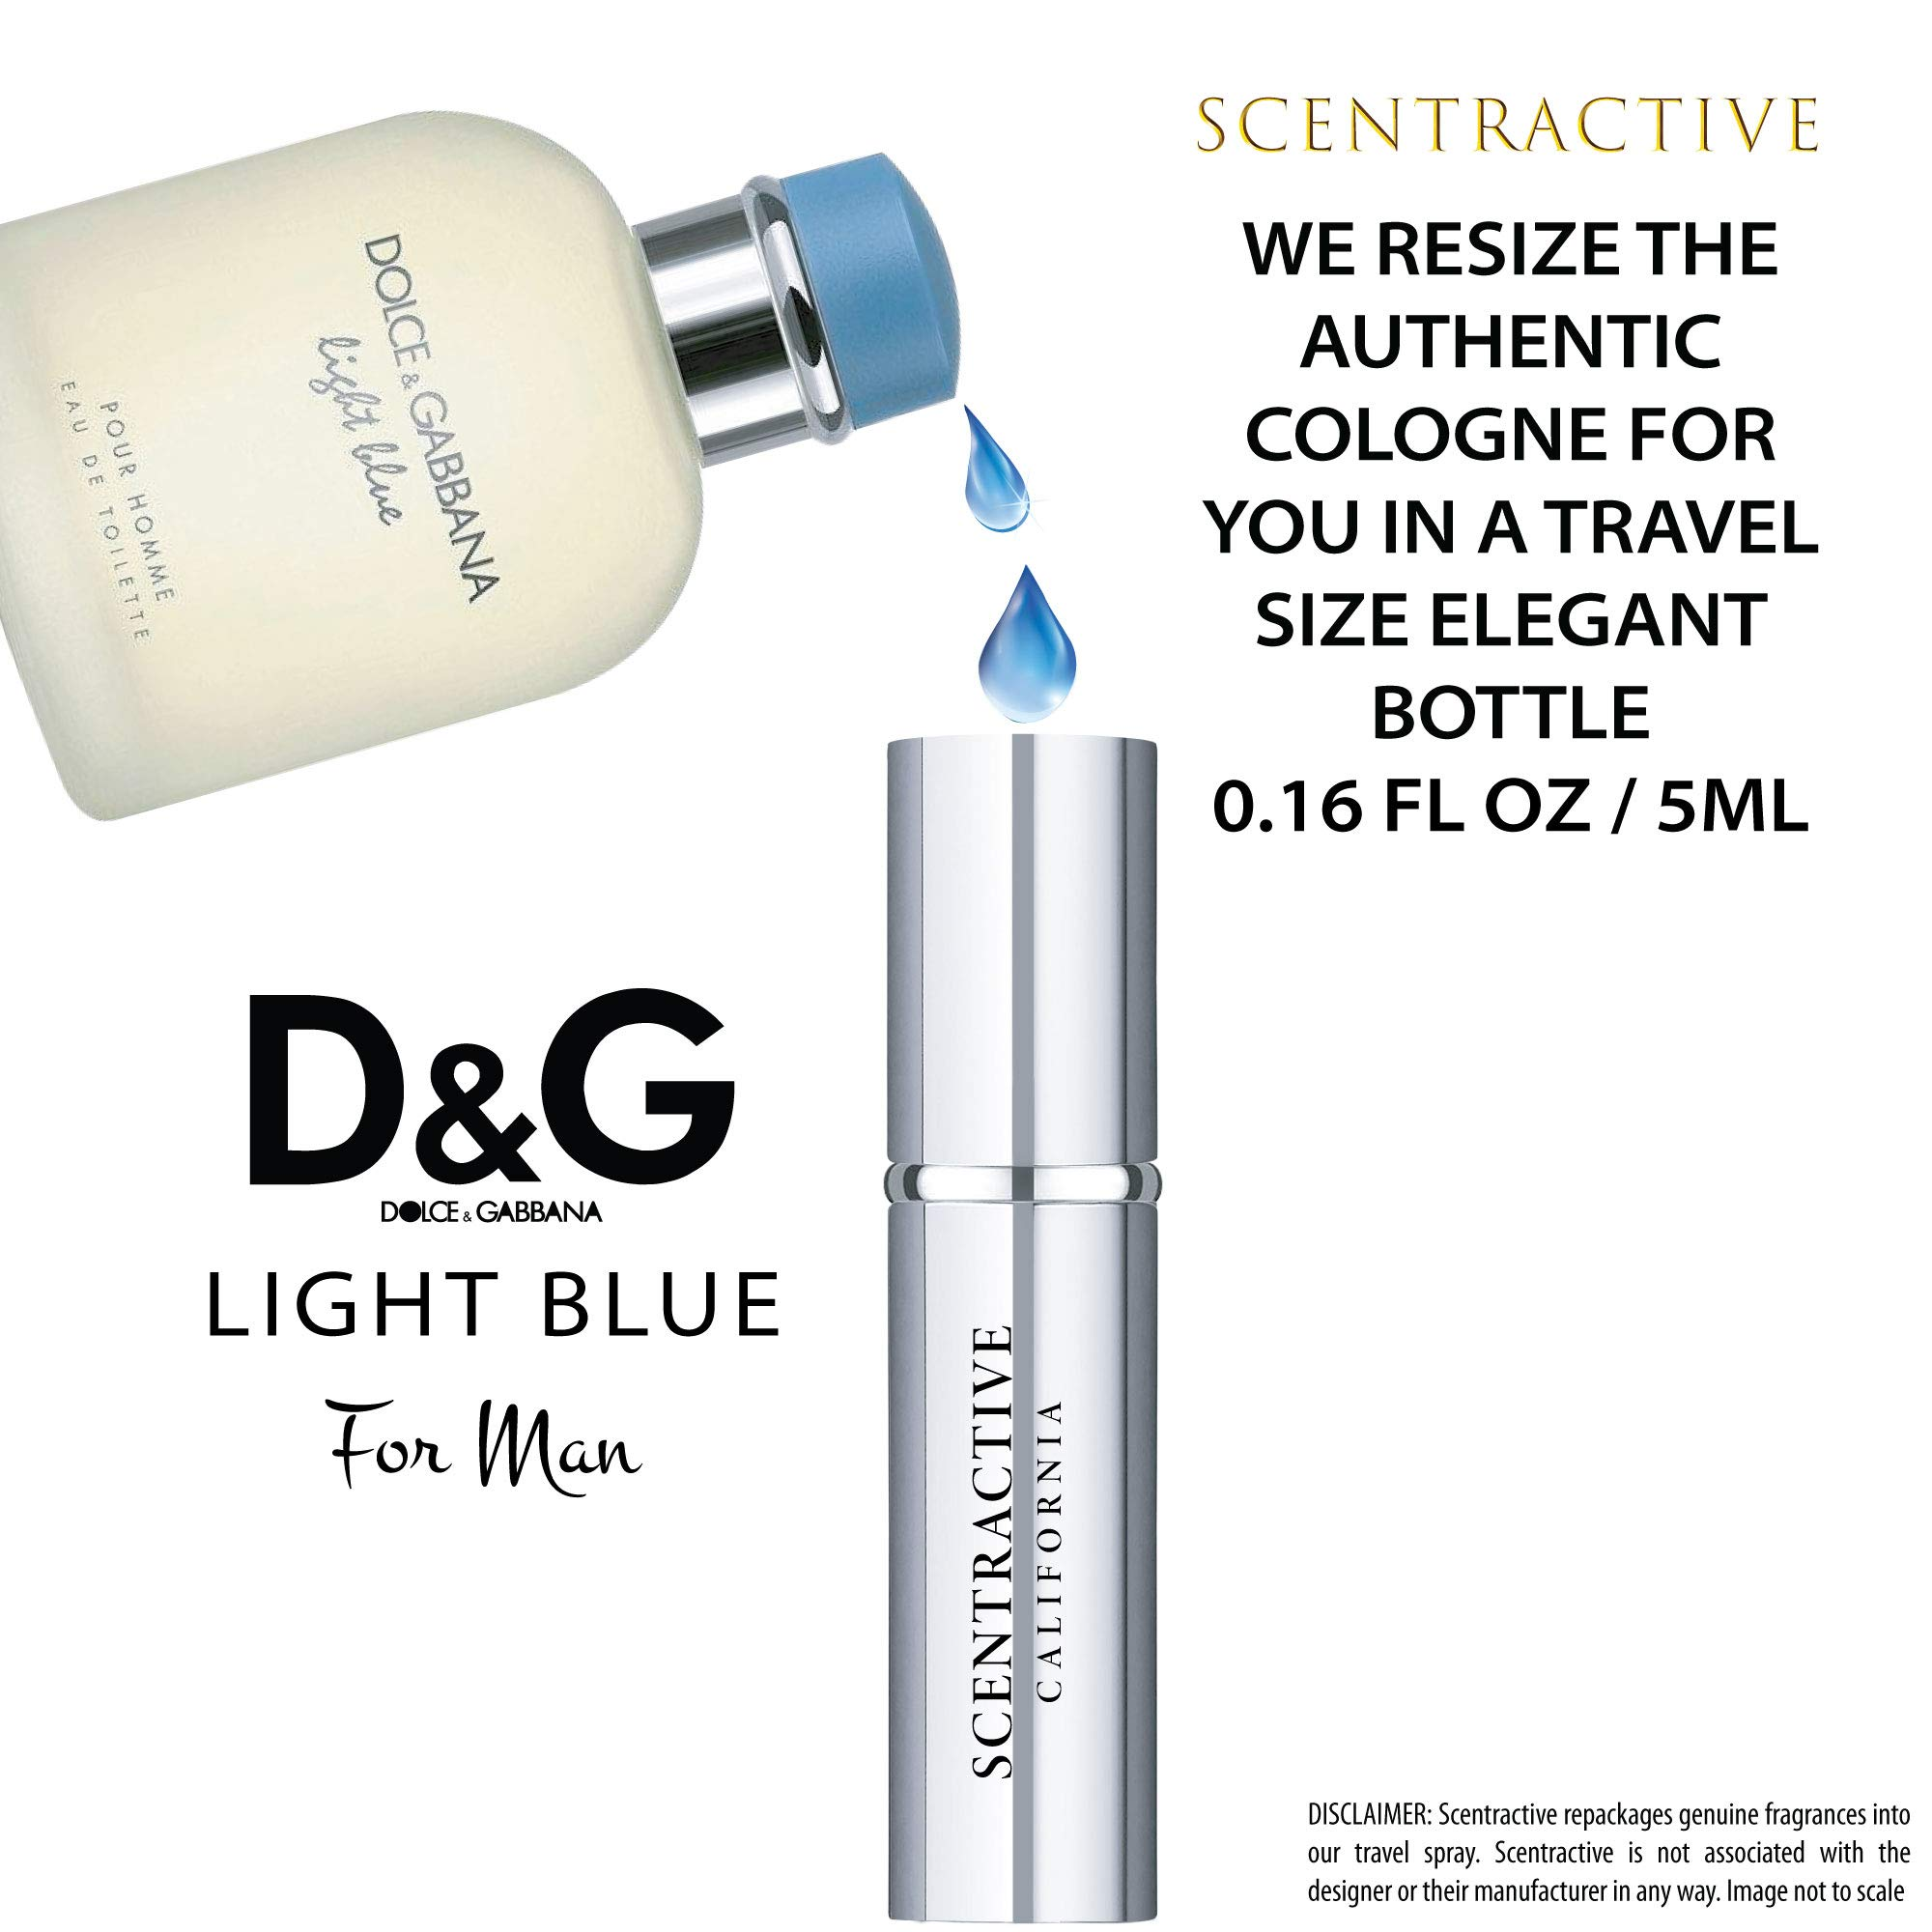 Dolce and Gabbana Light Blue Men Travel Mini Size Eau De Toilette Spray 5 ml / 0.16 Fl Oz